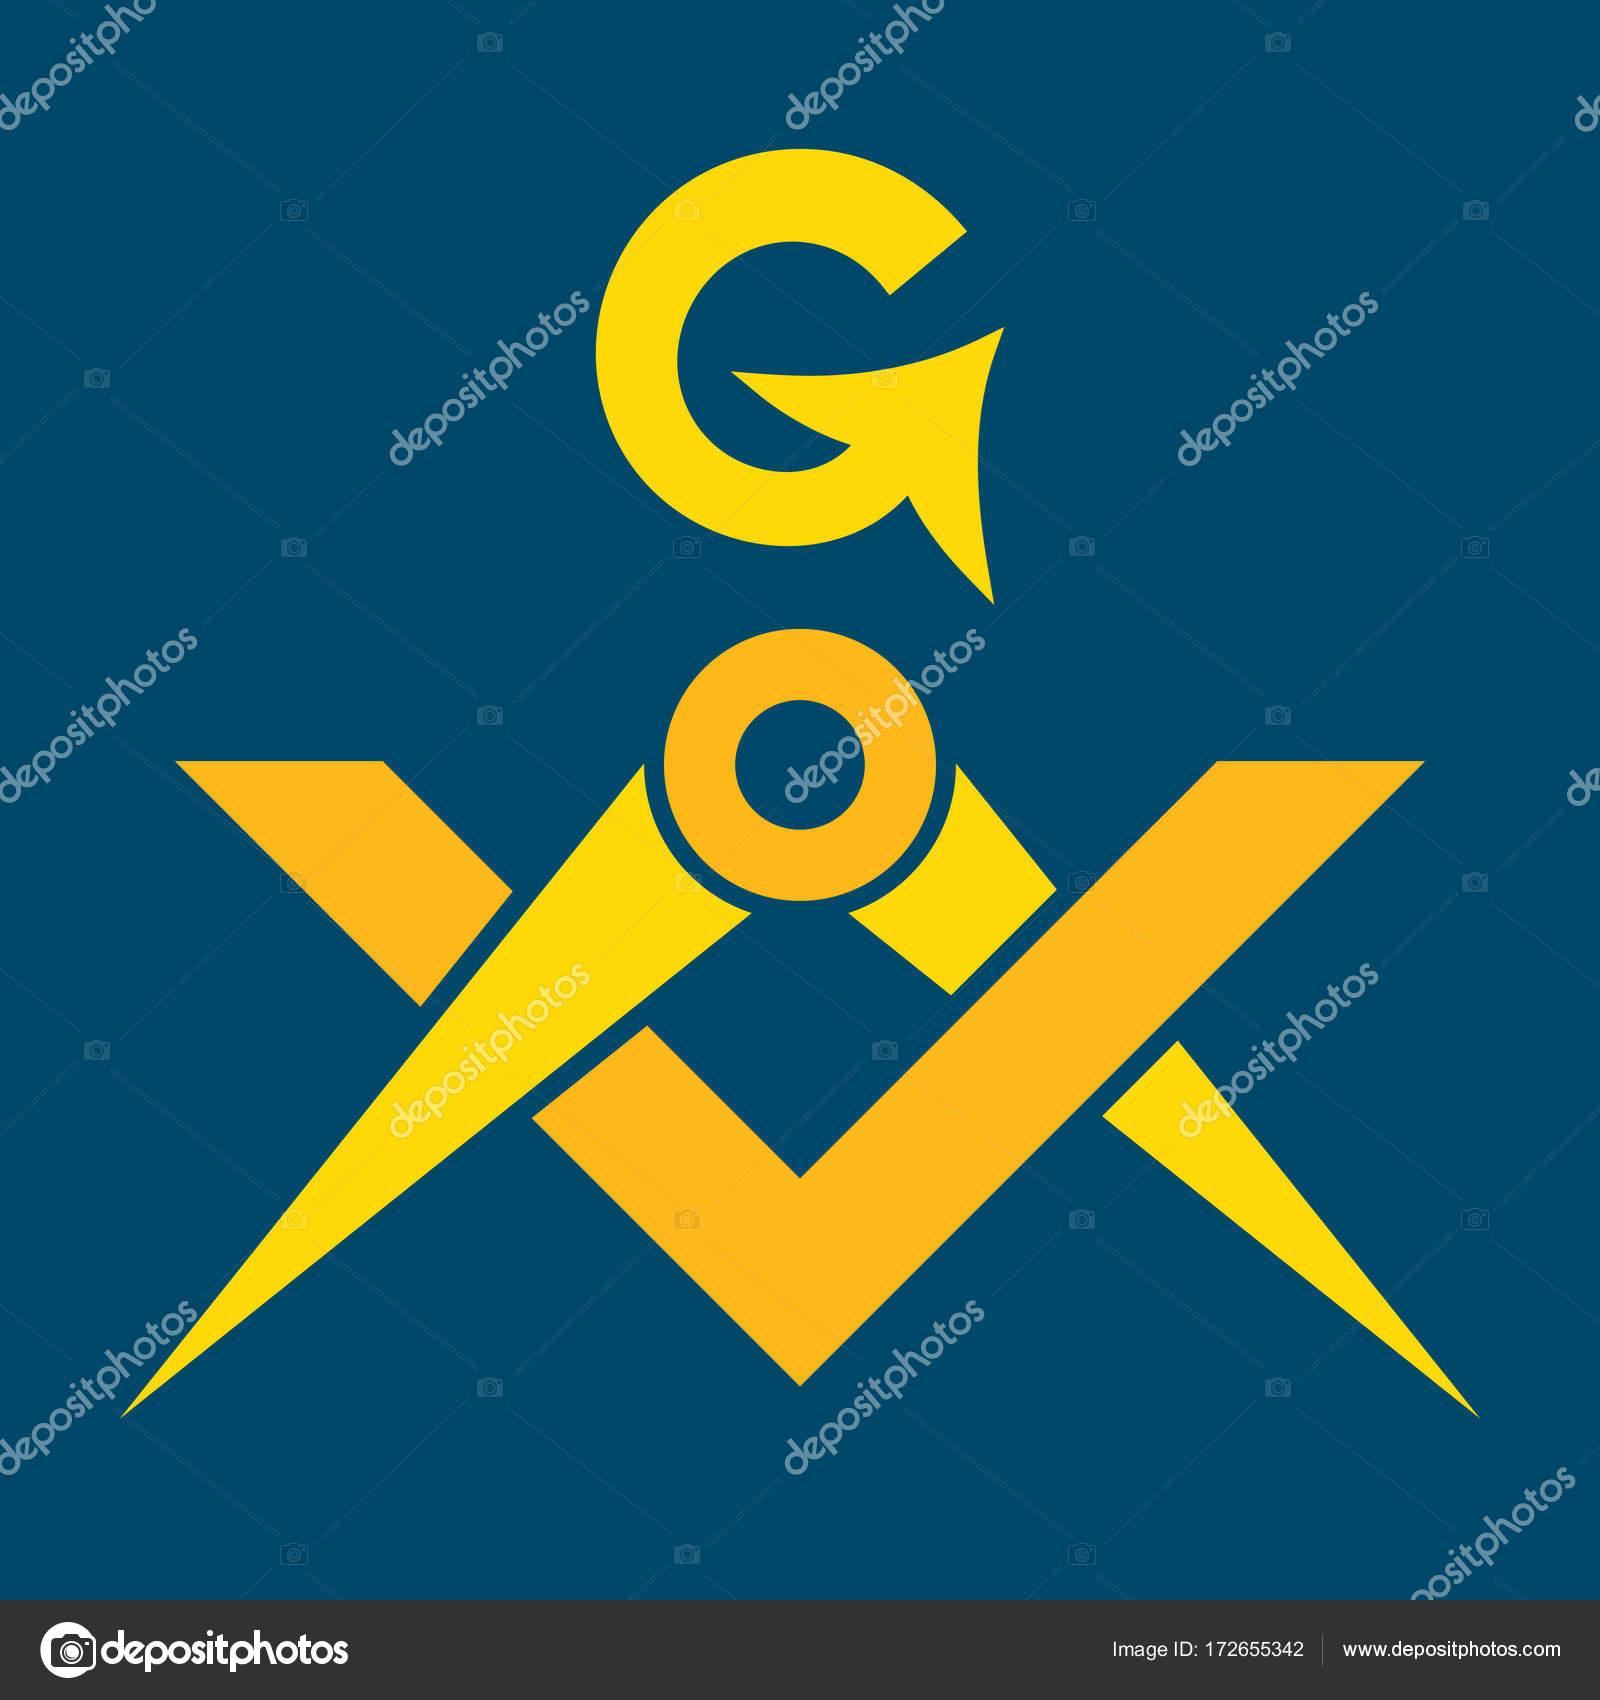 Masonic Square And Compasses Sacral Emblem Of Secret Fraternity